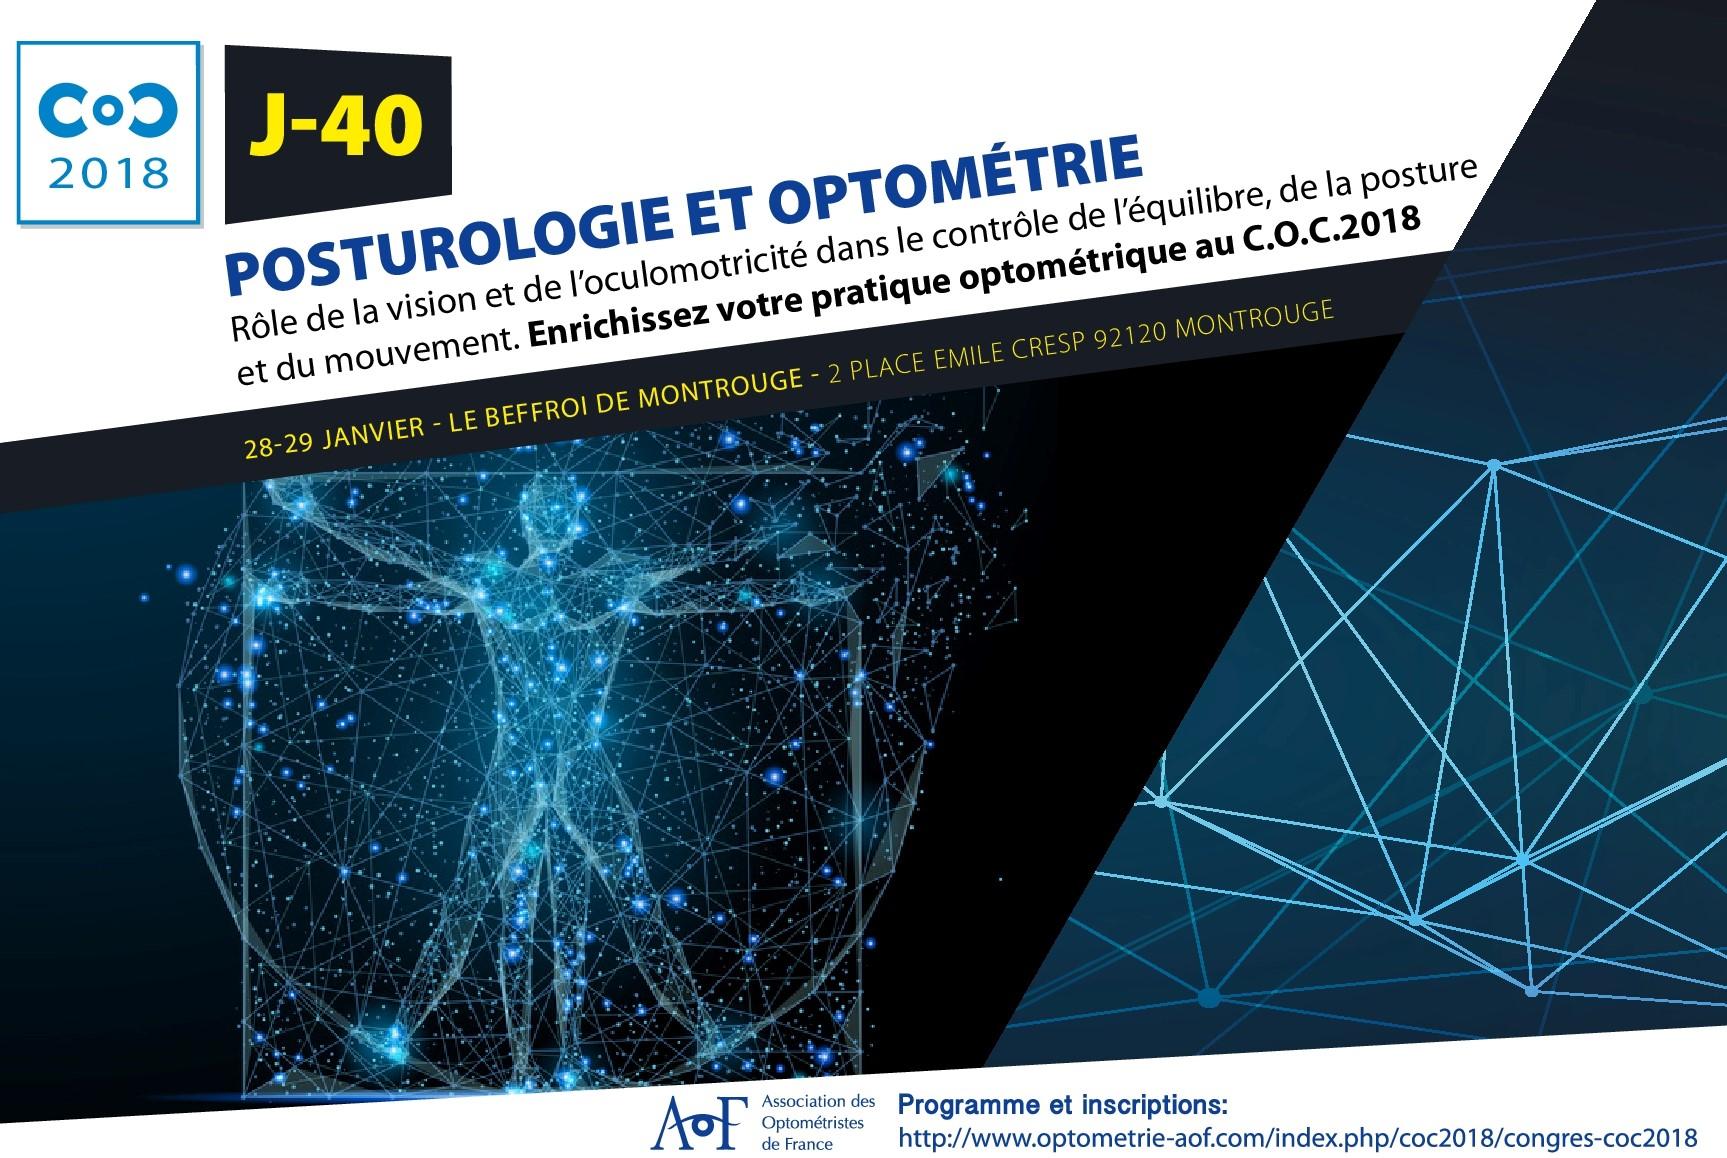 C.O.C 2018 J-40 : Posturologie et optométrie